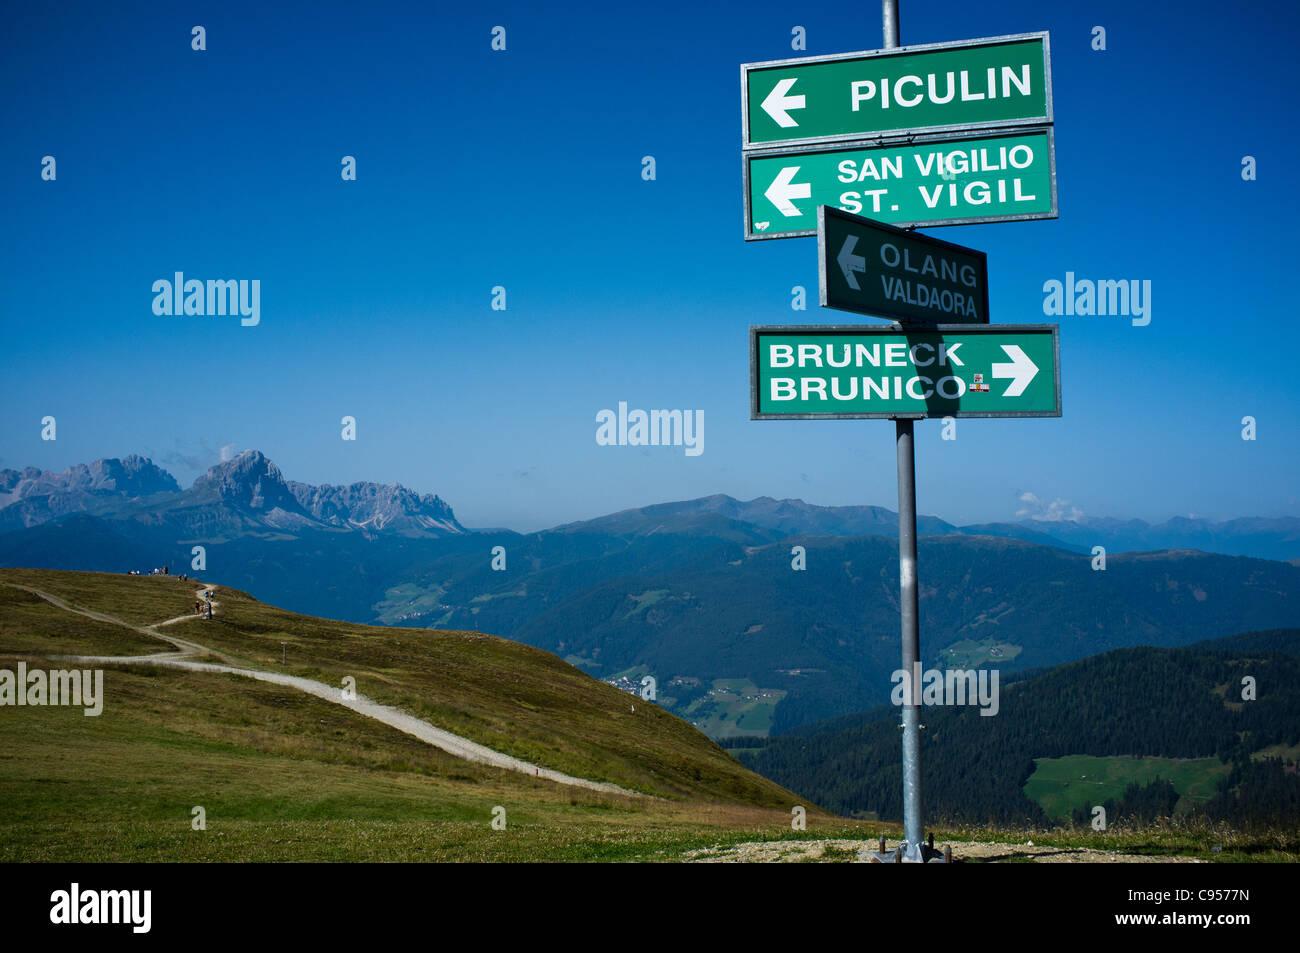 Direction indications sign on Kronplatz in the Italian Dolomites. - Stock Image